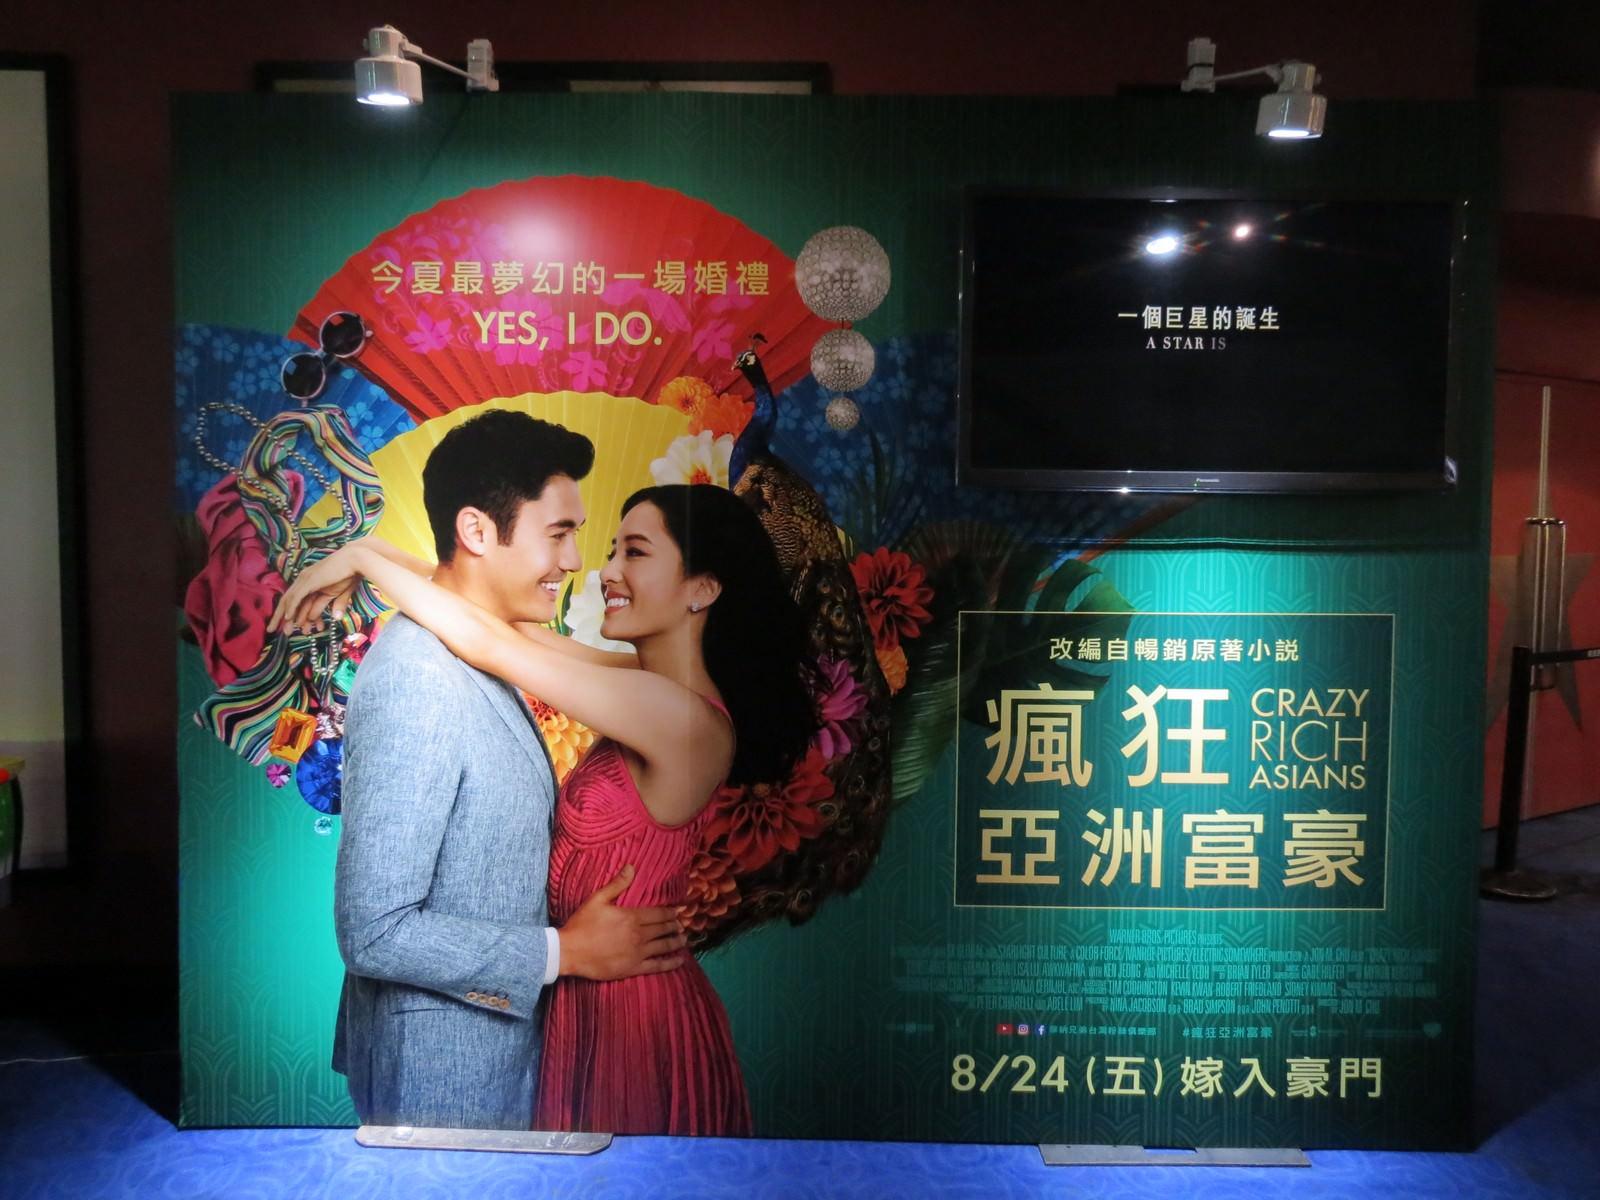 Movie, Crazy Rich Asians(美國, 2018) / 瘋狂亞洲富豪(台) / 我的超豪男友(港) / 摘金奇缘(網), 廣告看板, 華威天母影城